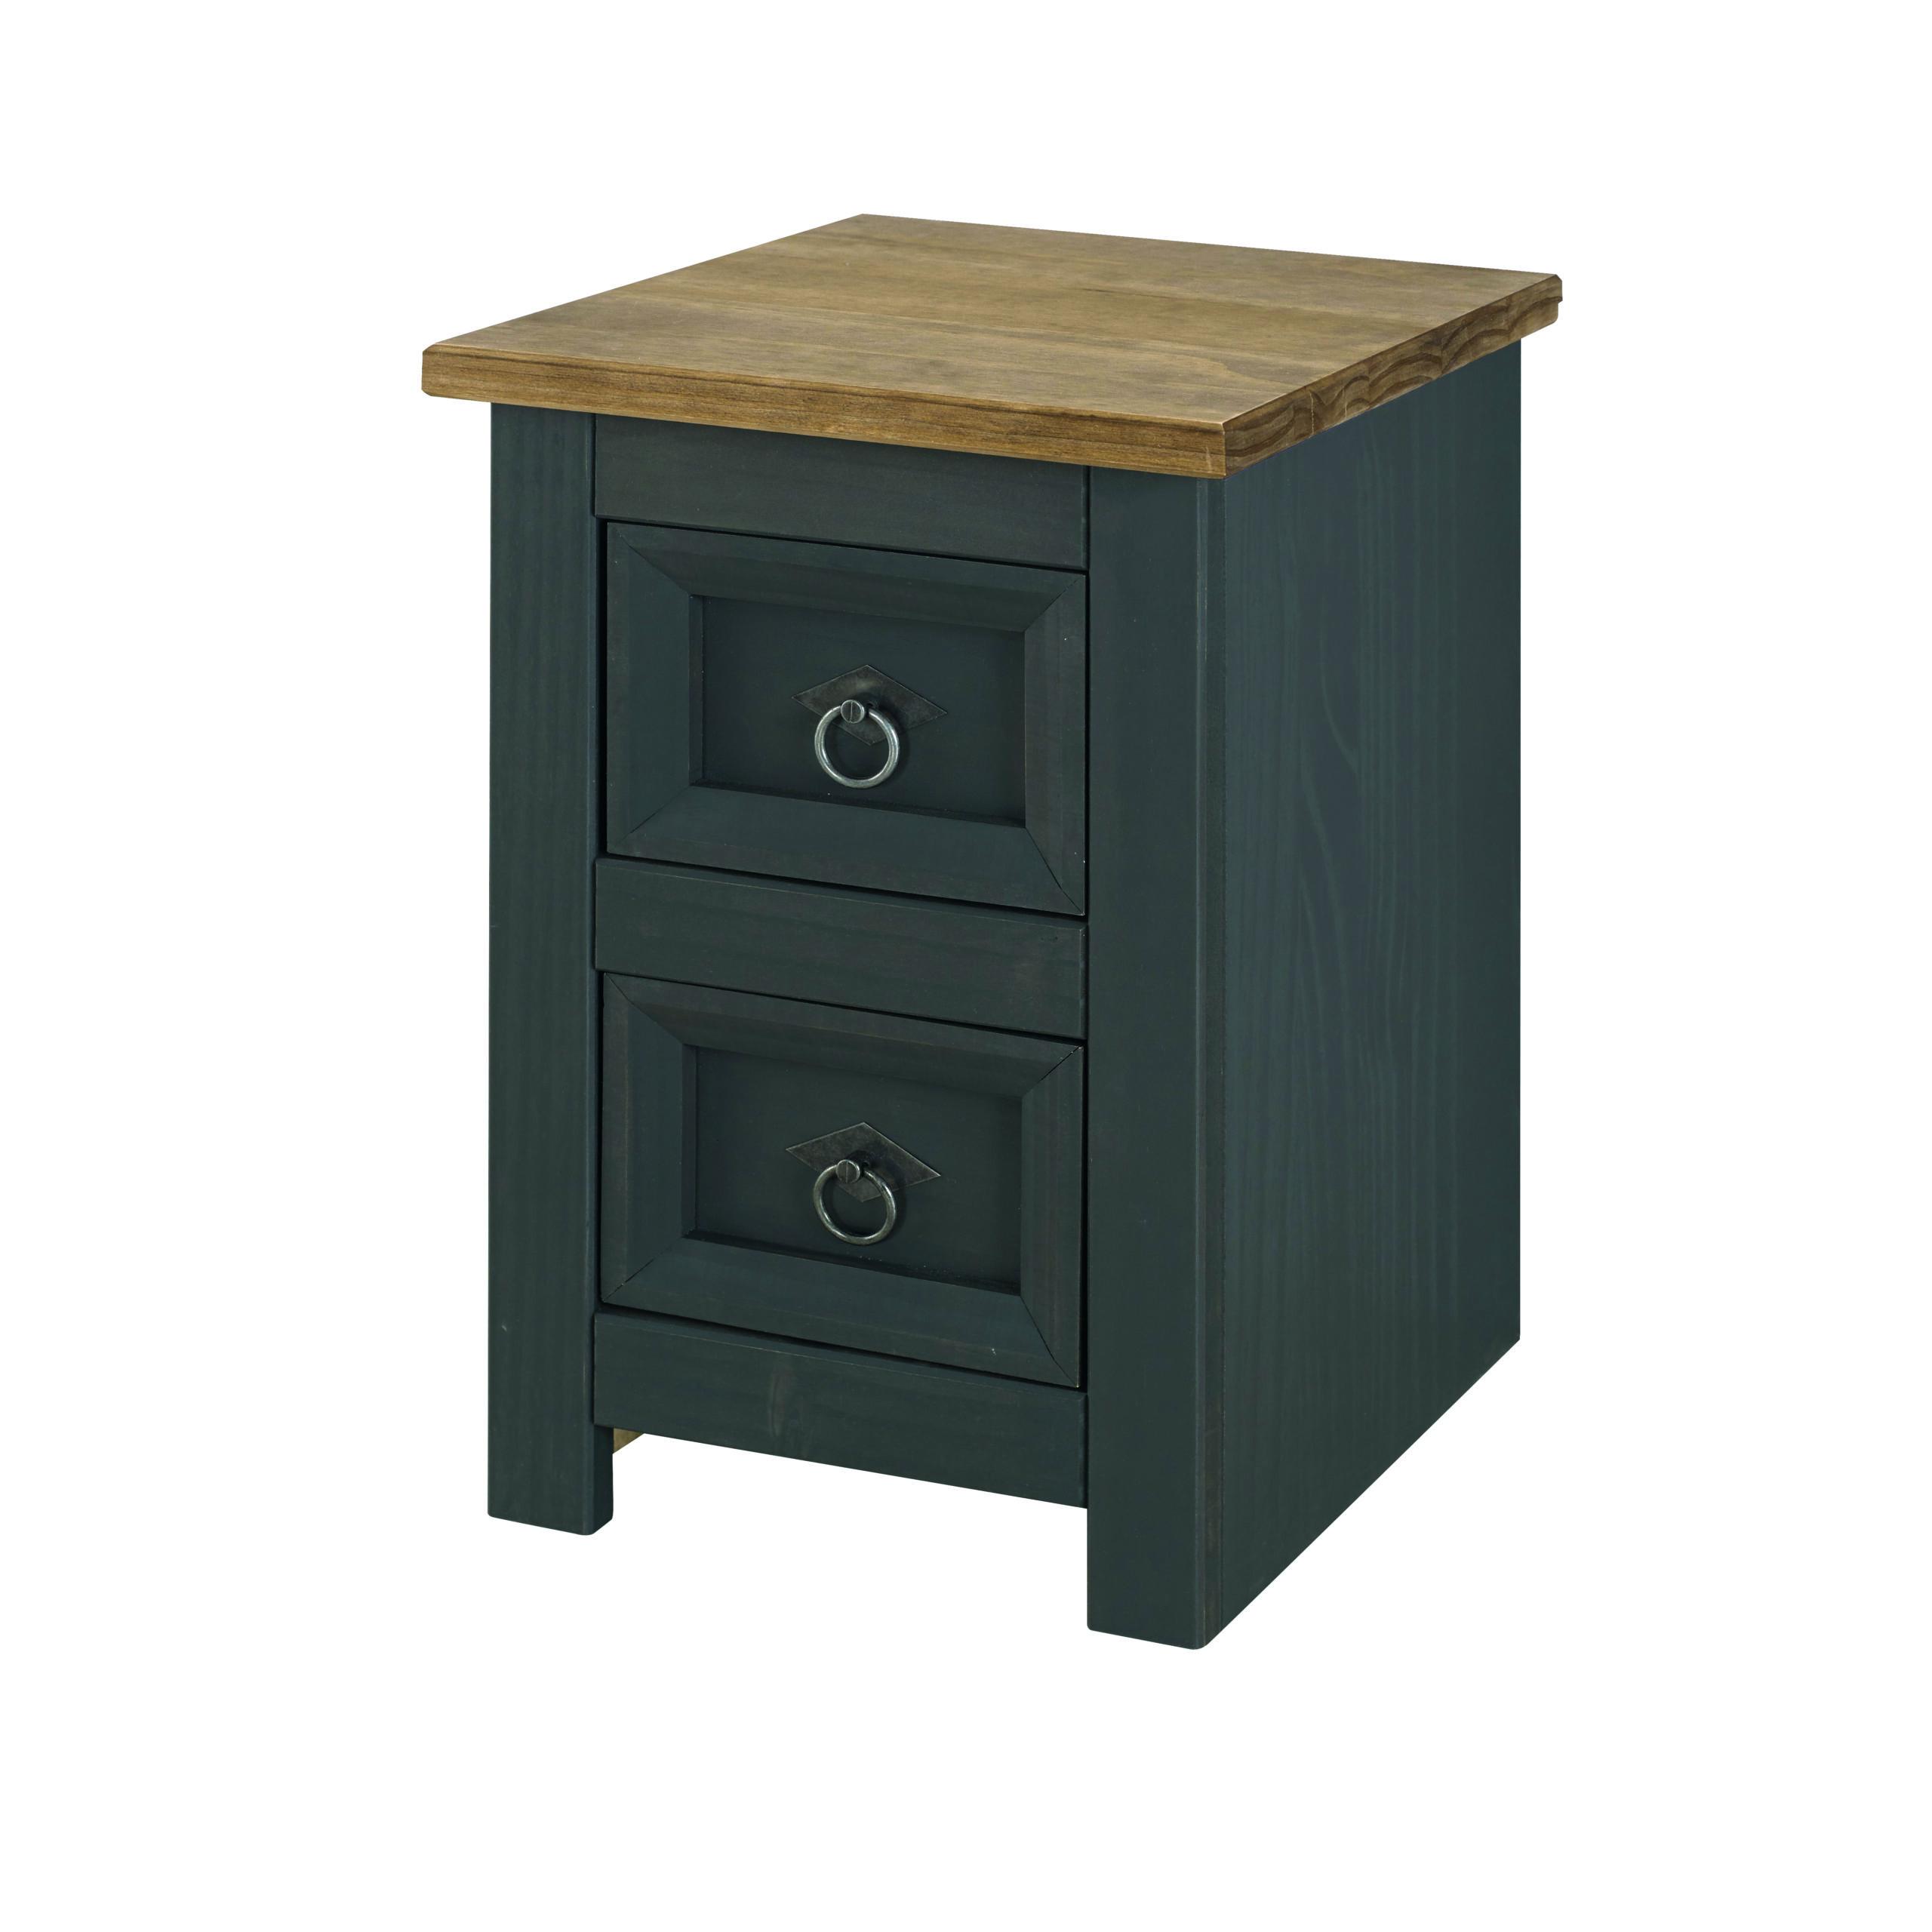 Caladonea Carbon 2 drawer petite bedside cabinet